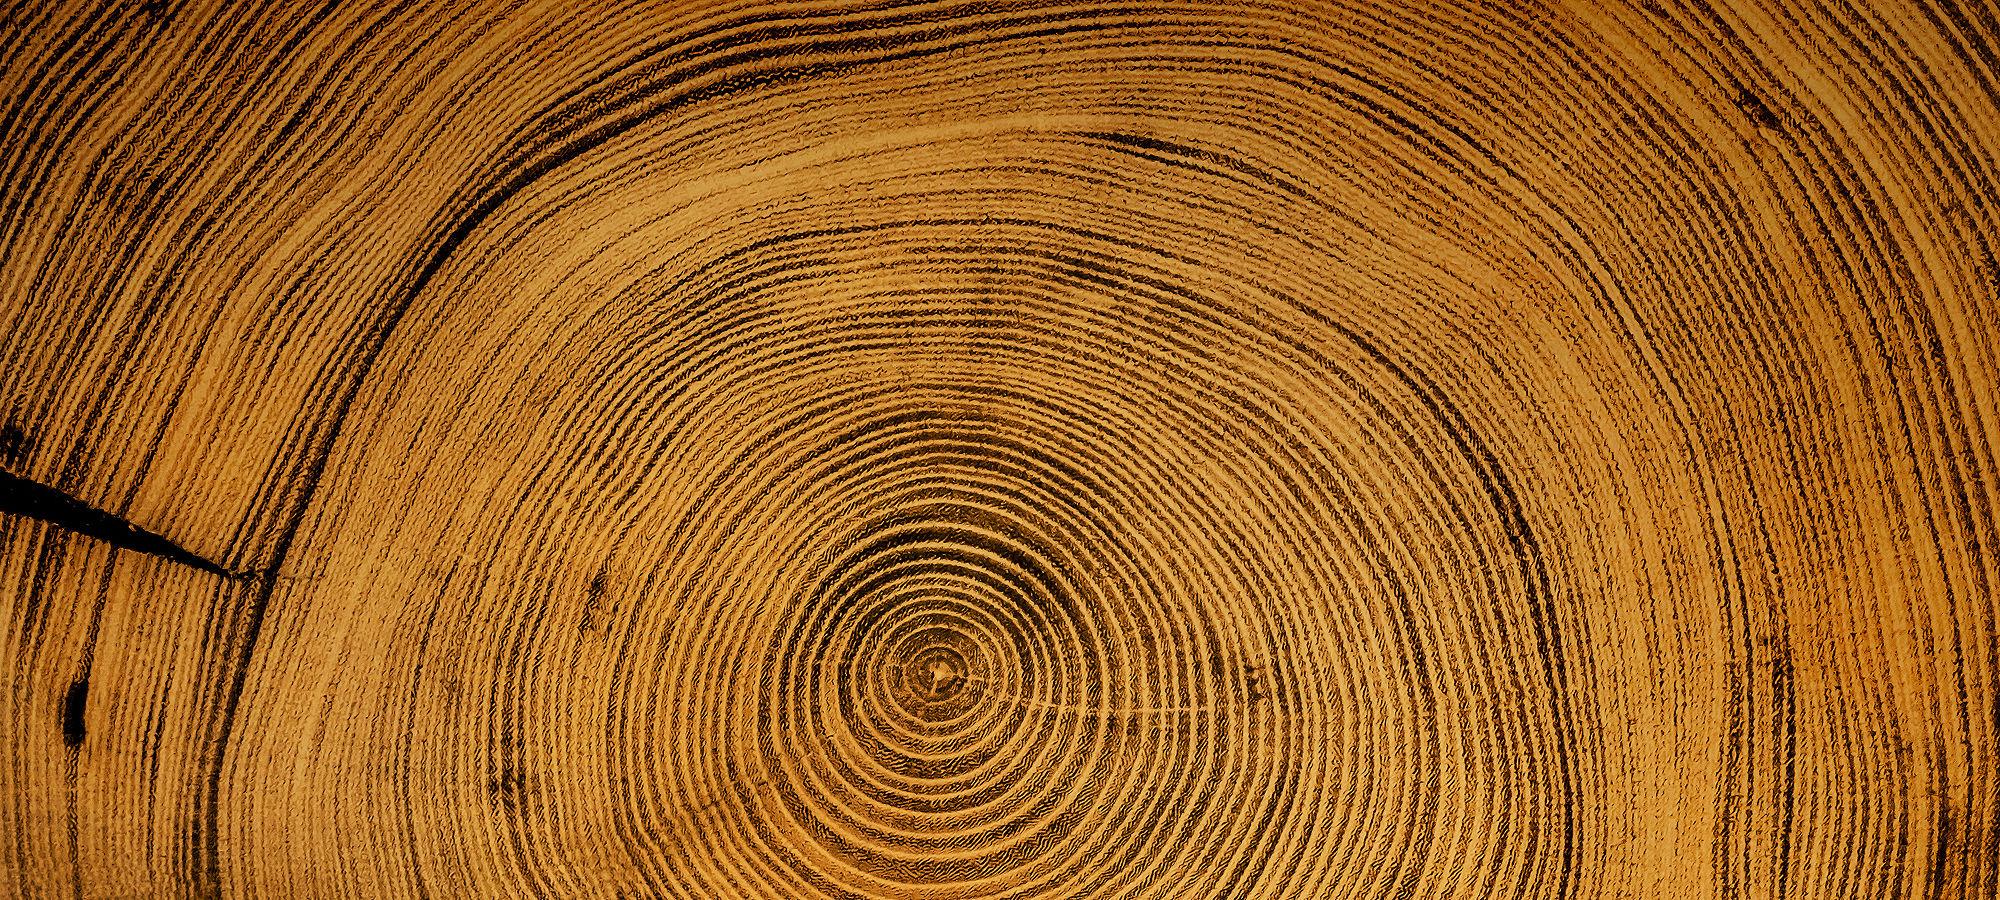 Wooden spiral tree trunk